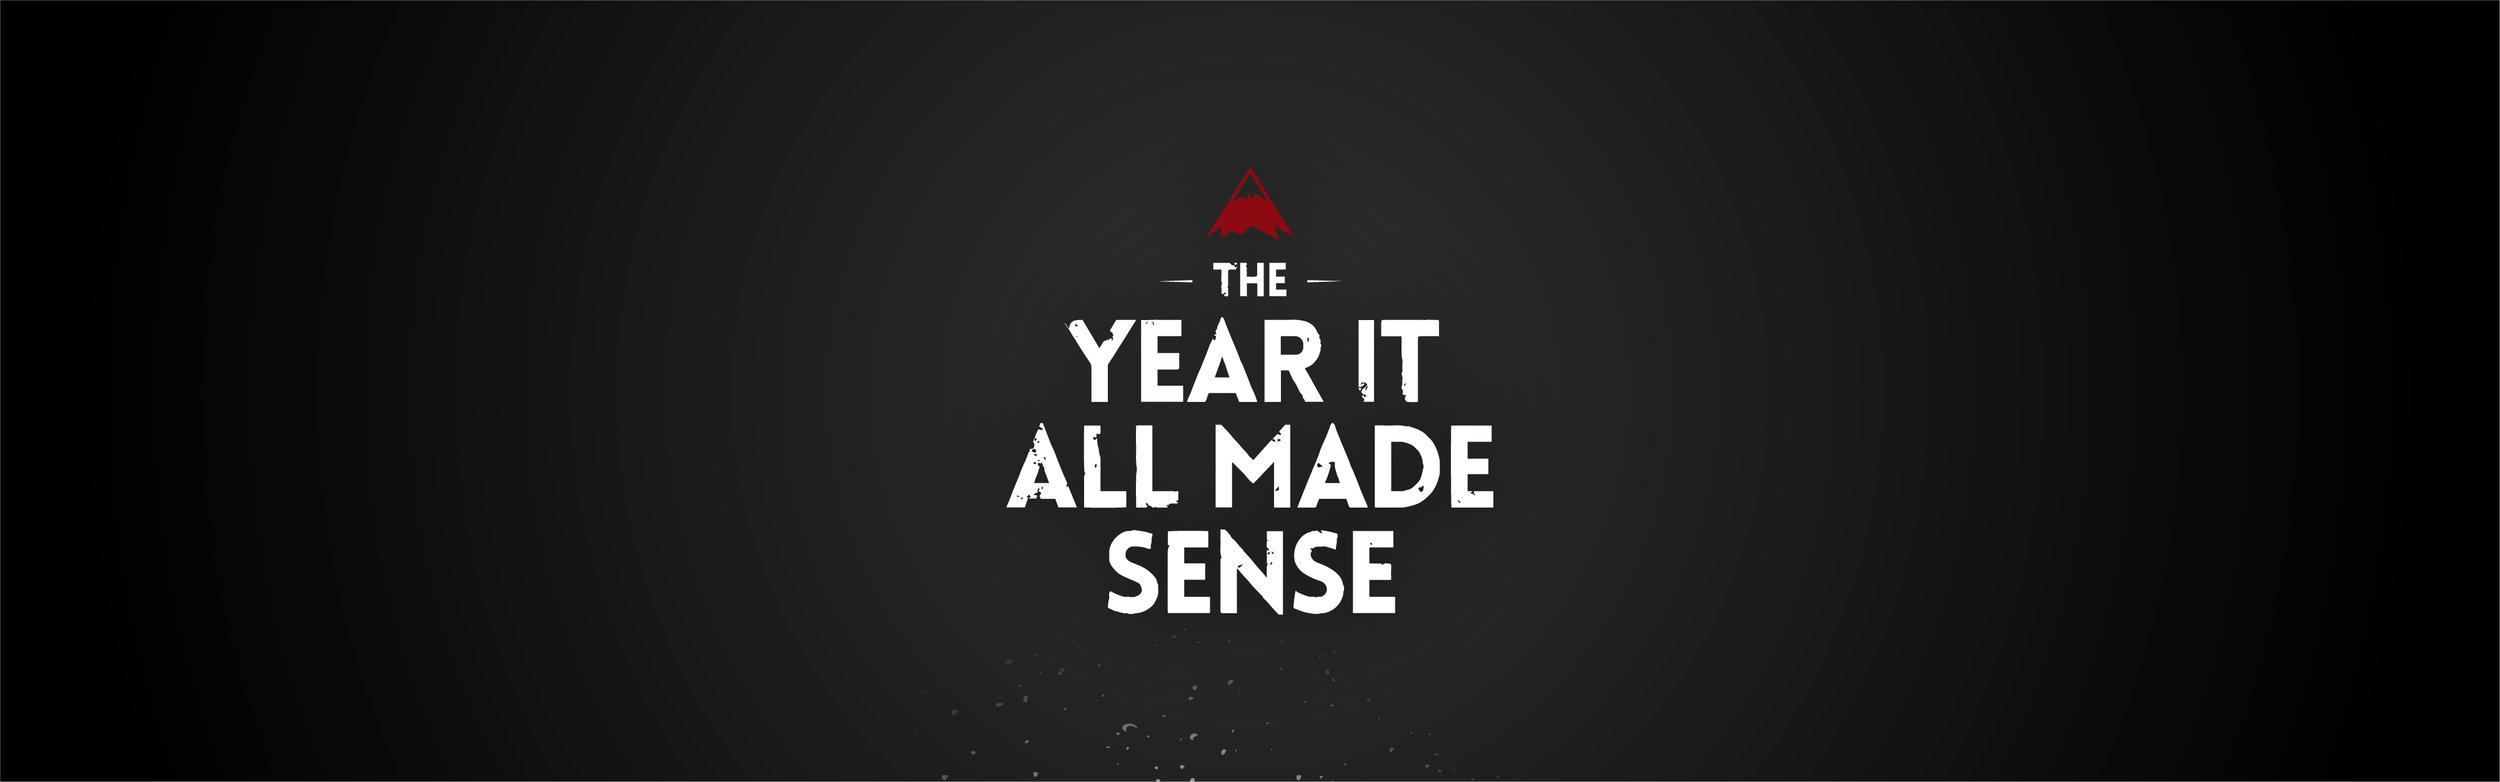 The year it all made sense-01.jpg